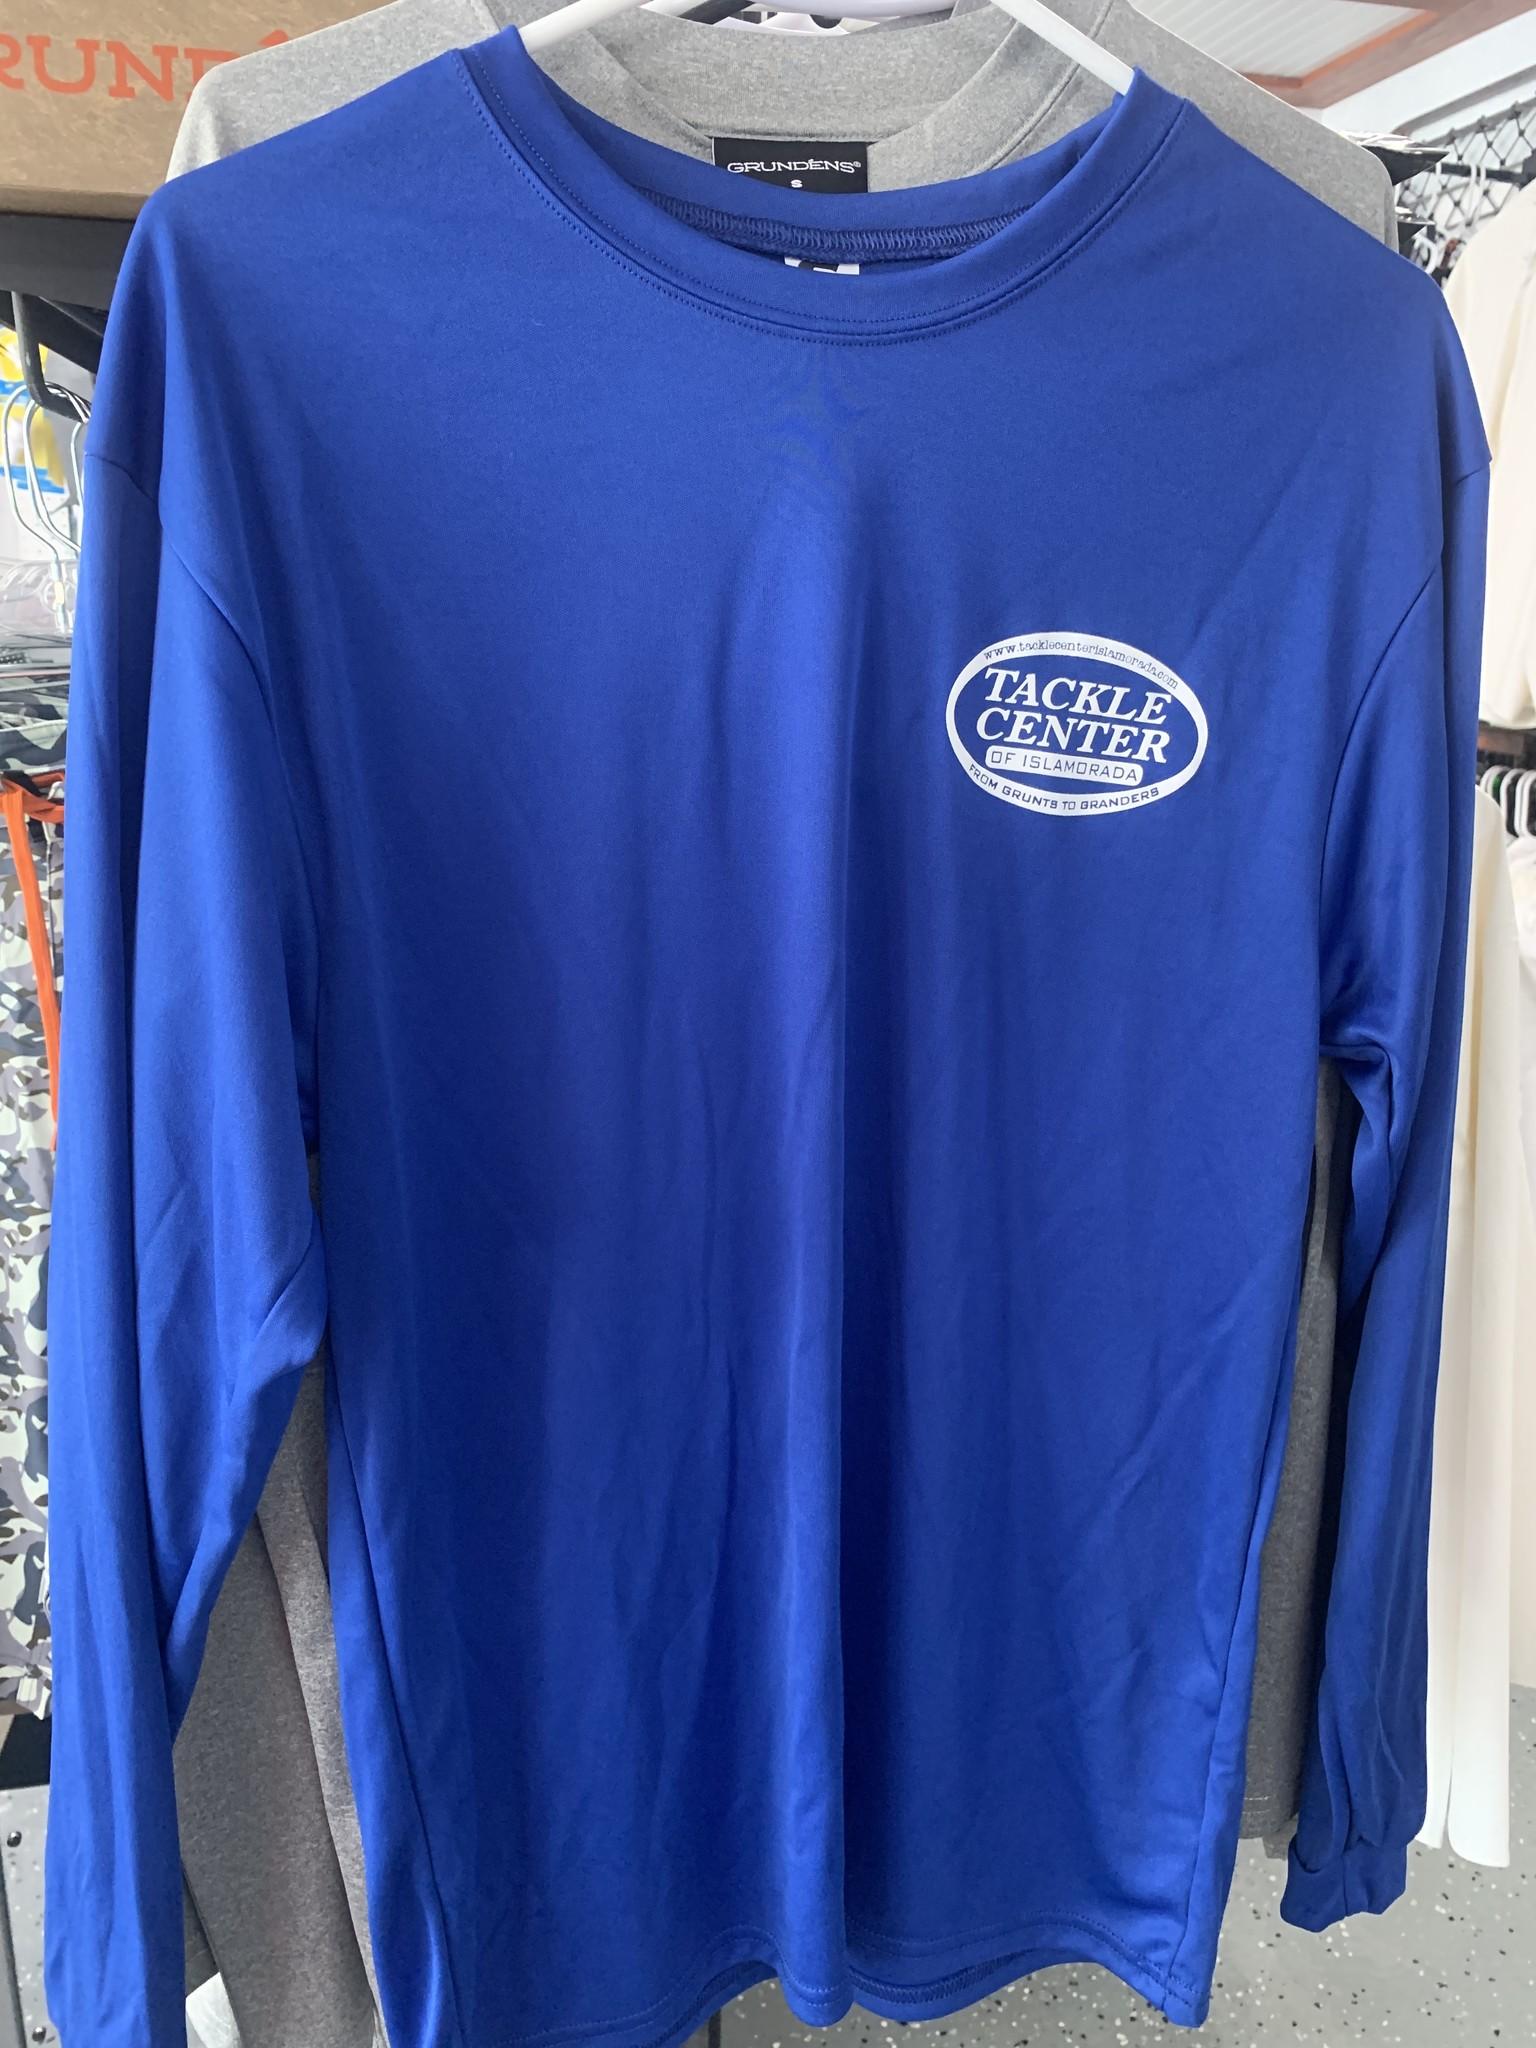 Tackle Center UPF Performance Shirt Blue